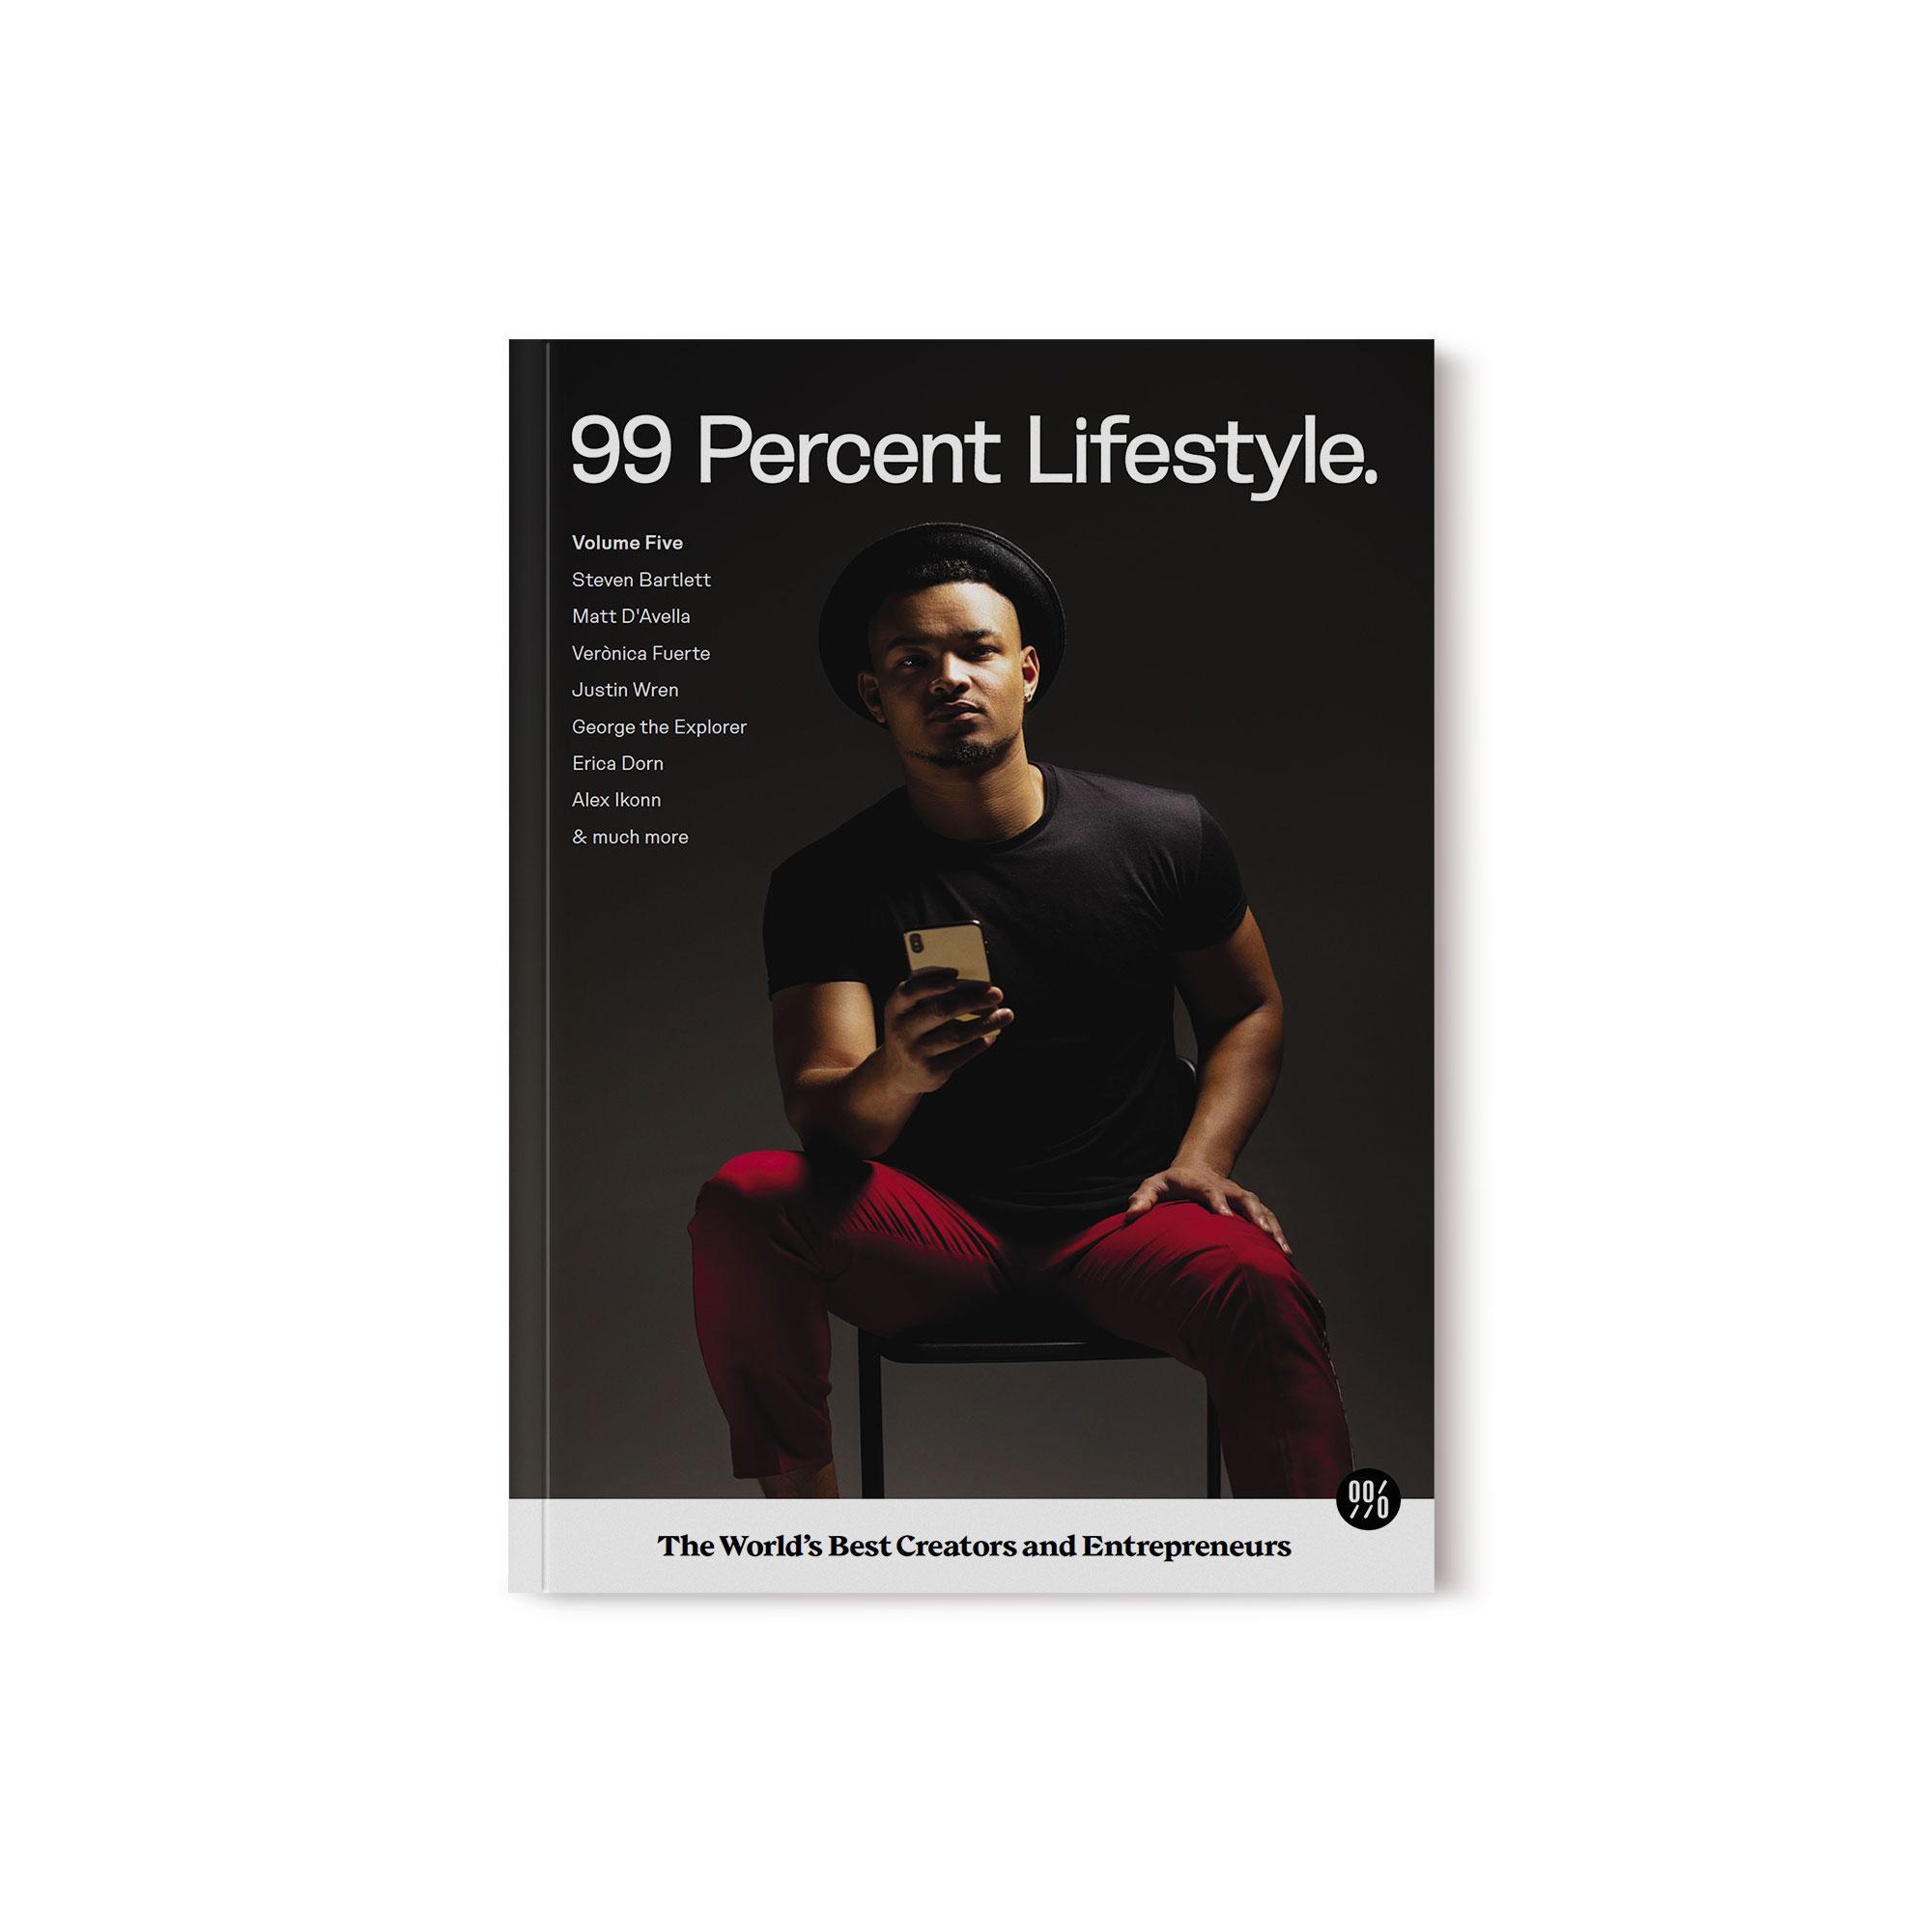 99 Percent Lifestyle Volume 5